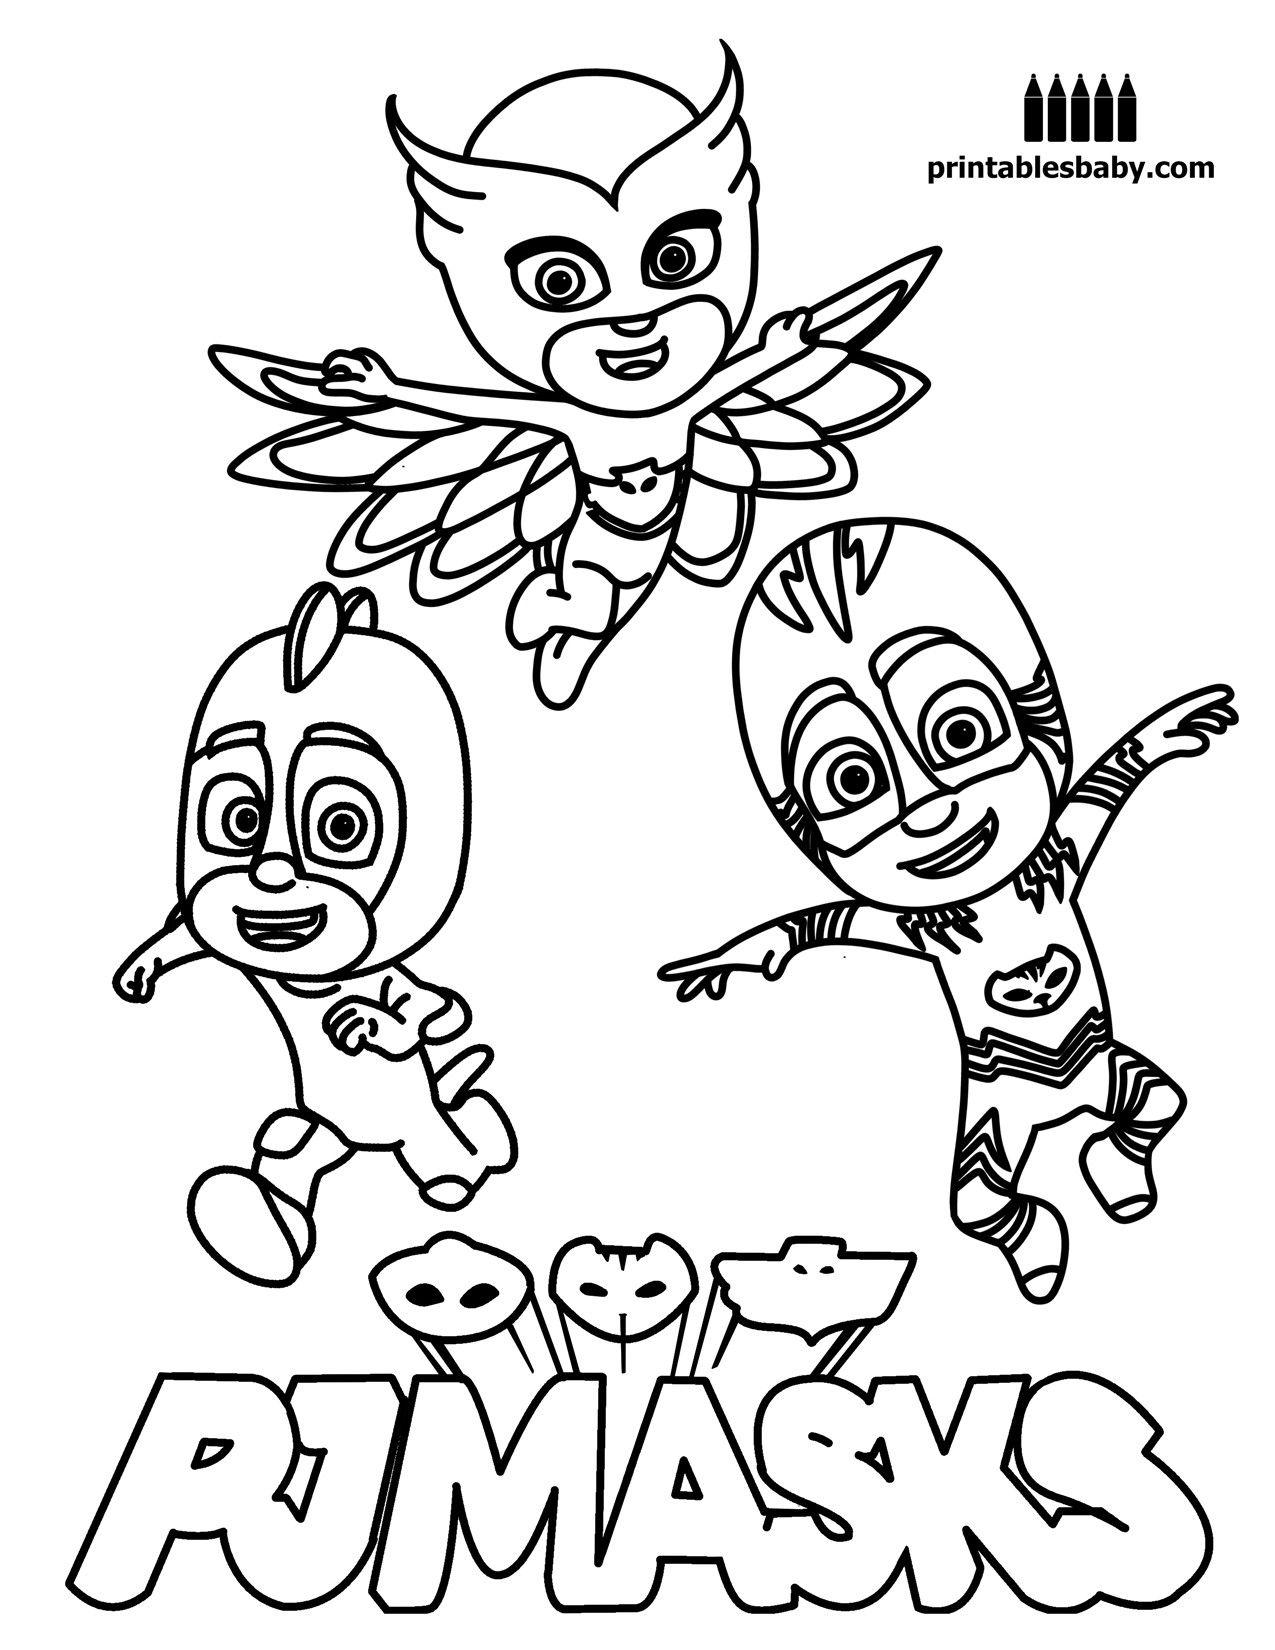 Paw Patrol Coloring Page Free Youngandtae Com Em 2020 Desenhos Infantis Para Colorir Imprimir Desenhos Para Colorir Vingadores Para Colorir